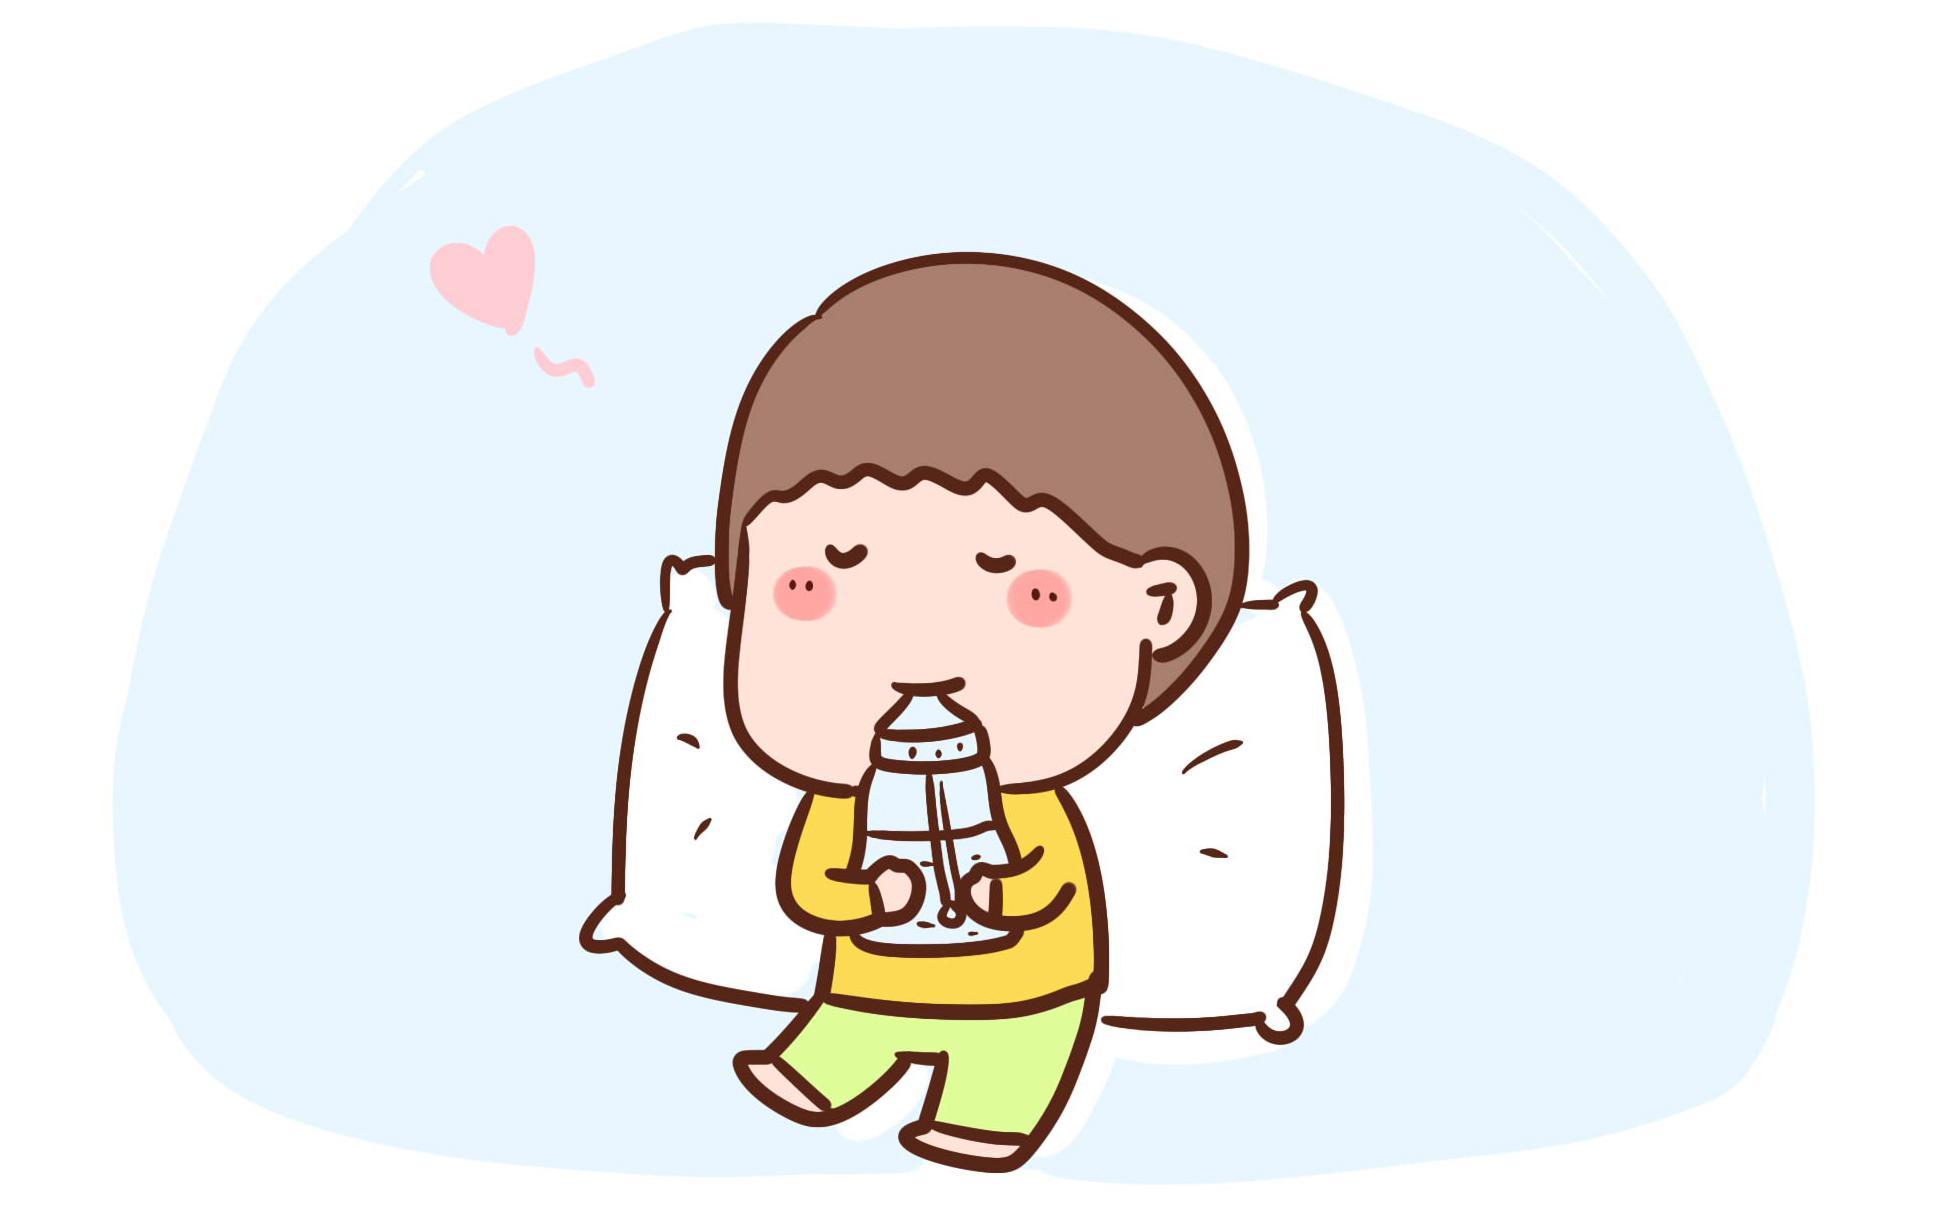 http://www.hbanda.cn/jiankang/279446.html